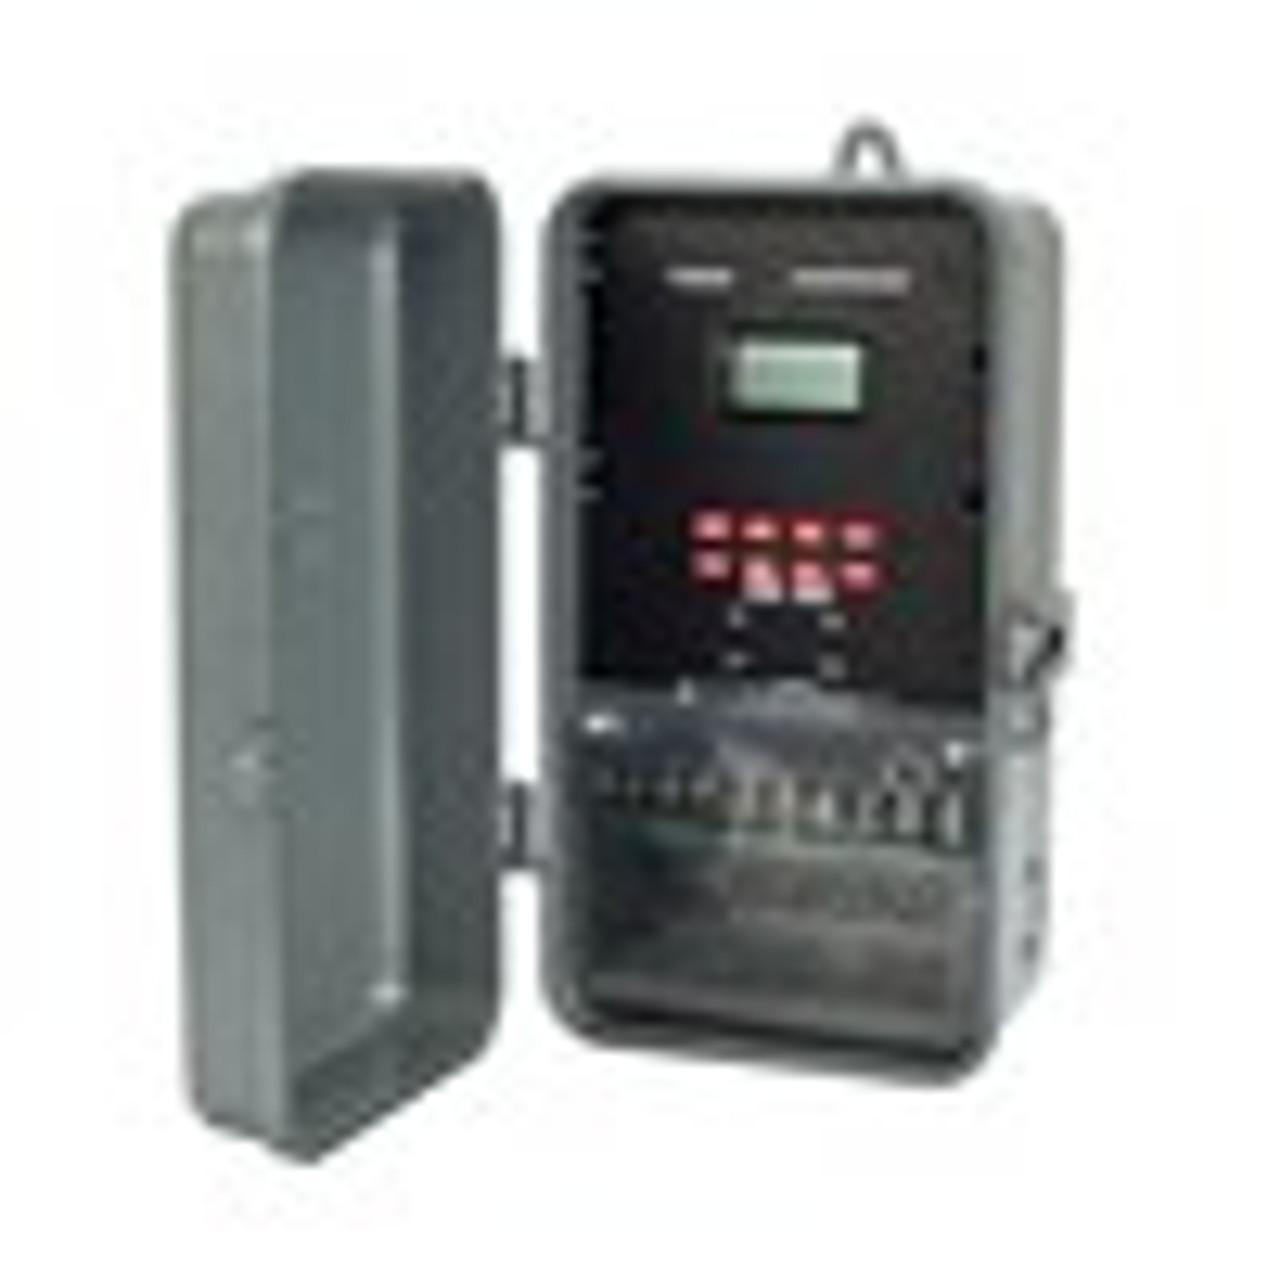 Tork DWZ200B, 2 Channel 7 Day Format Multipurpose Control